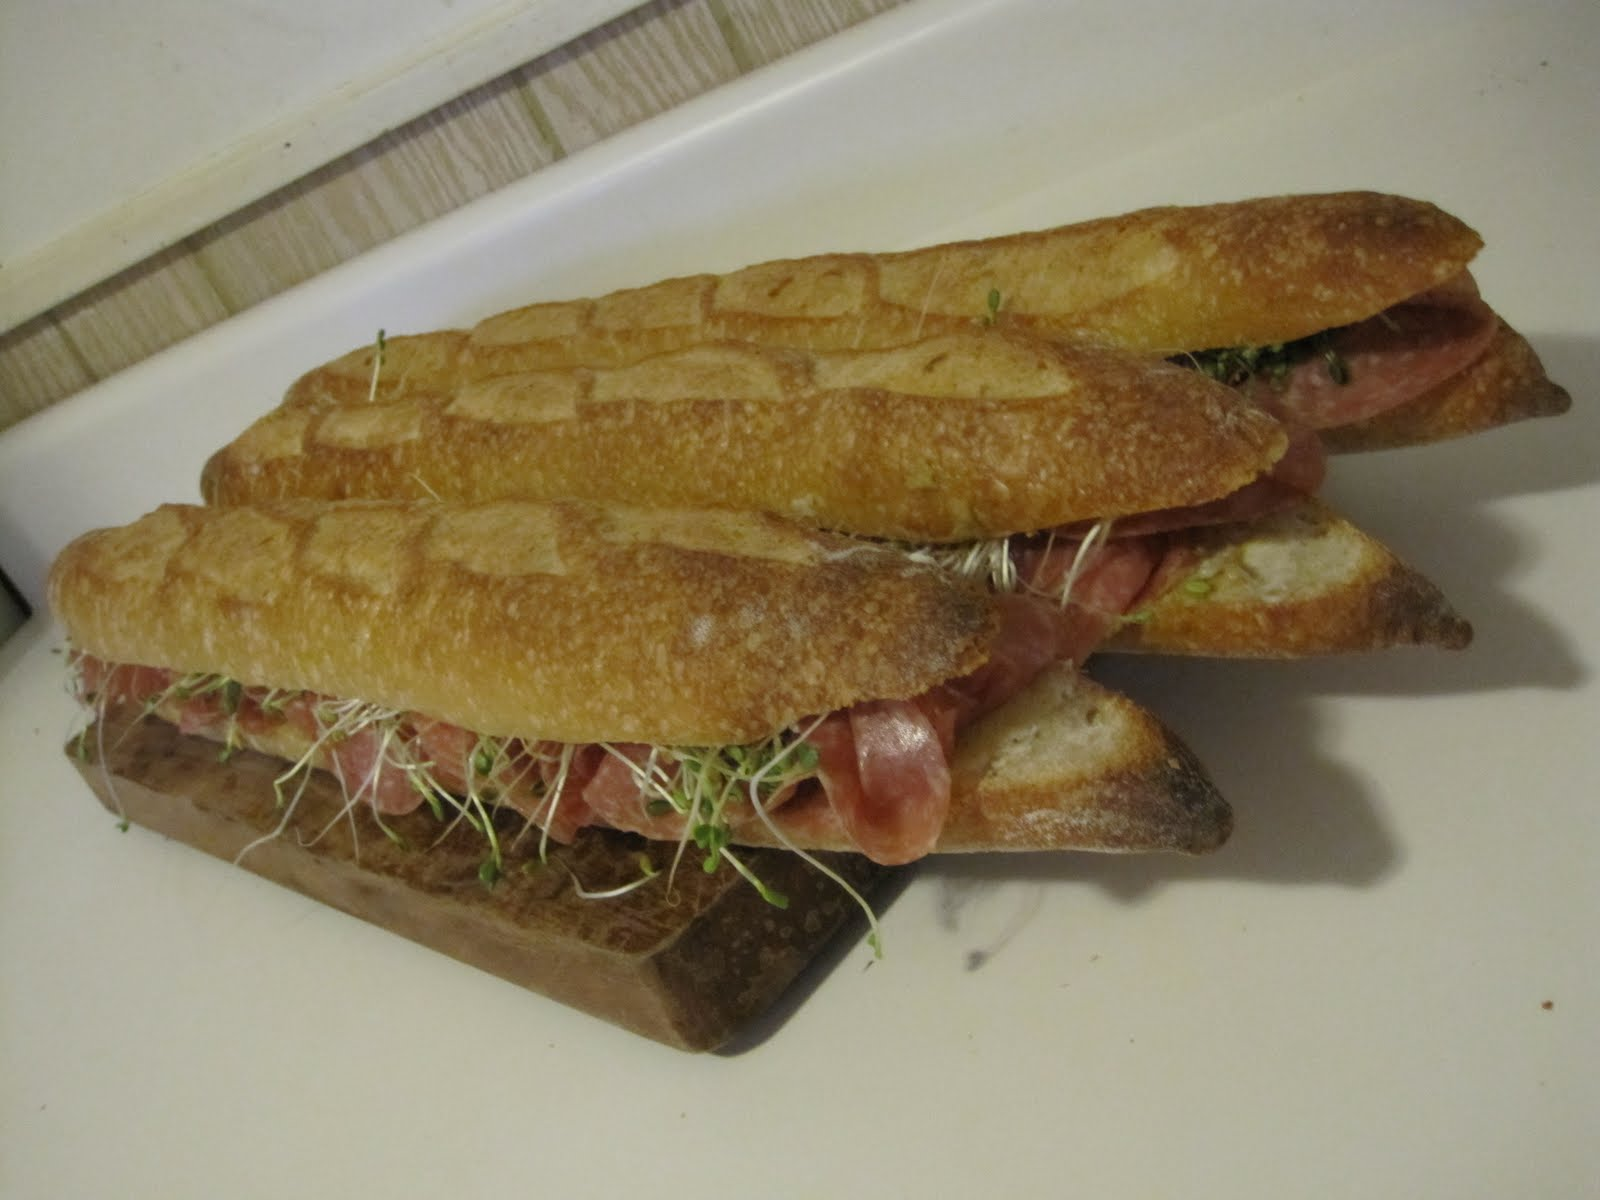 Oil Changes: the anti food blog food blog: Juniper Festival Catering